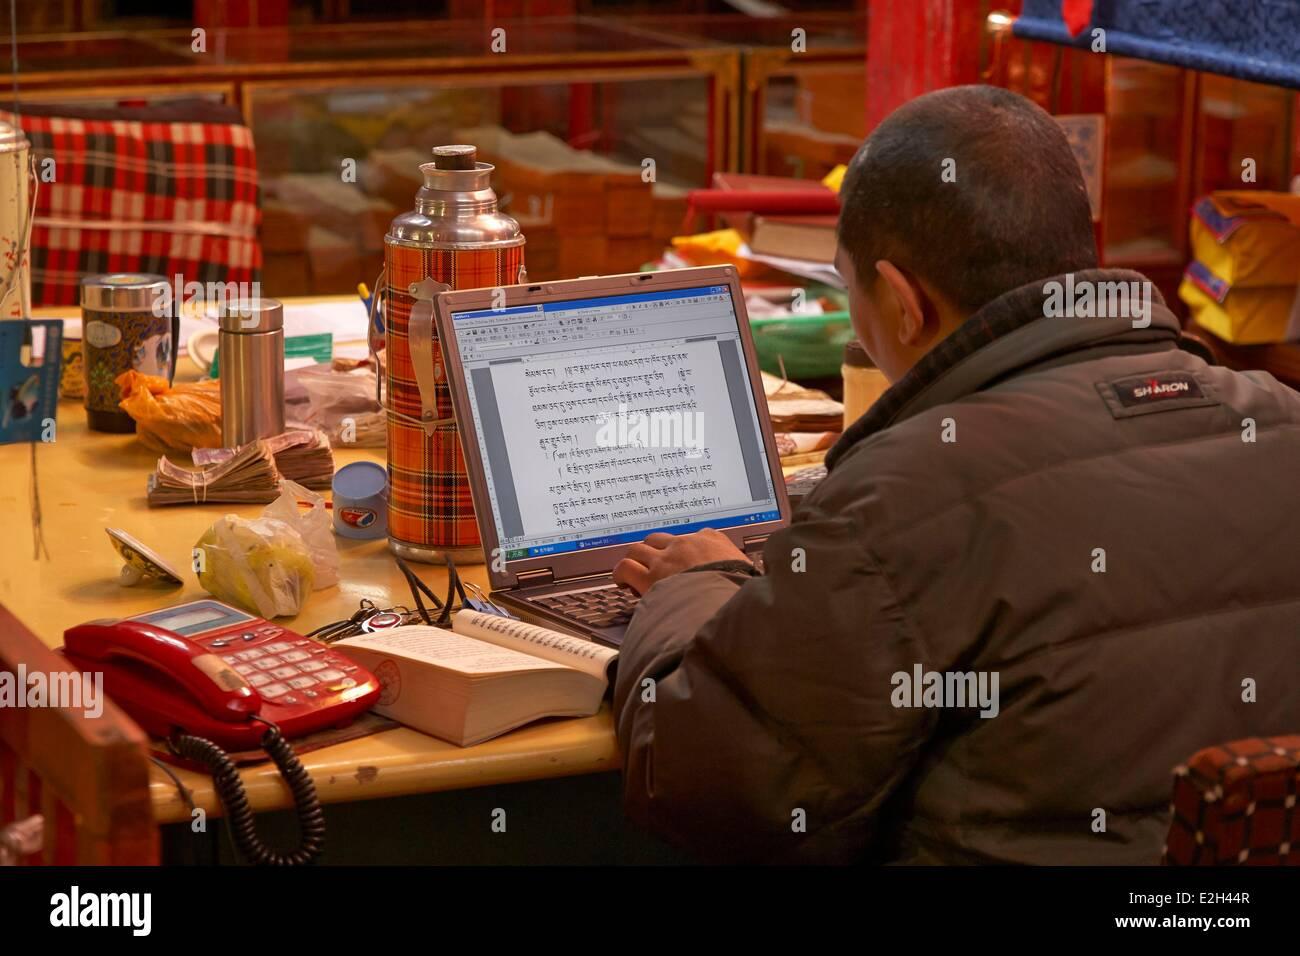 China Tibet Lhassa monk working on Buddist text on computer at Sera monastery - Stock Image